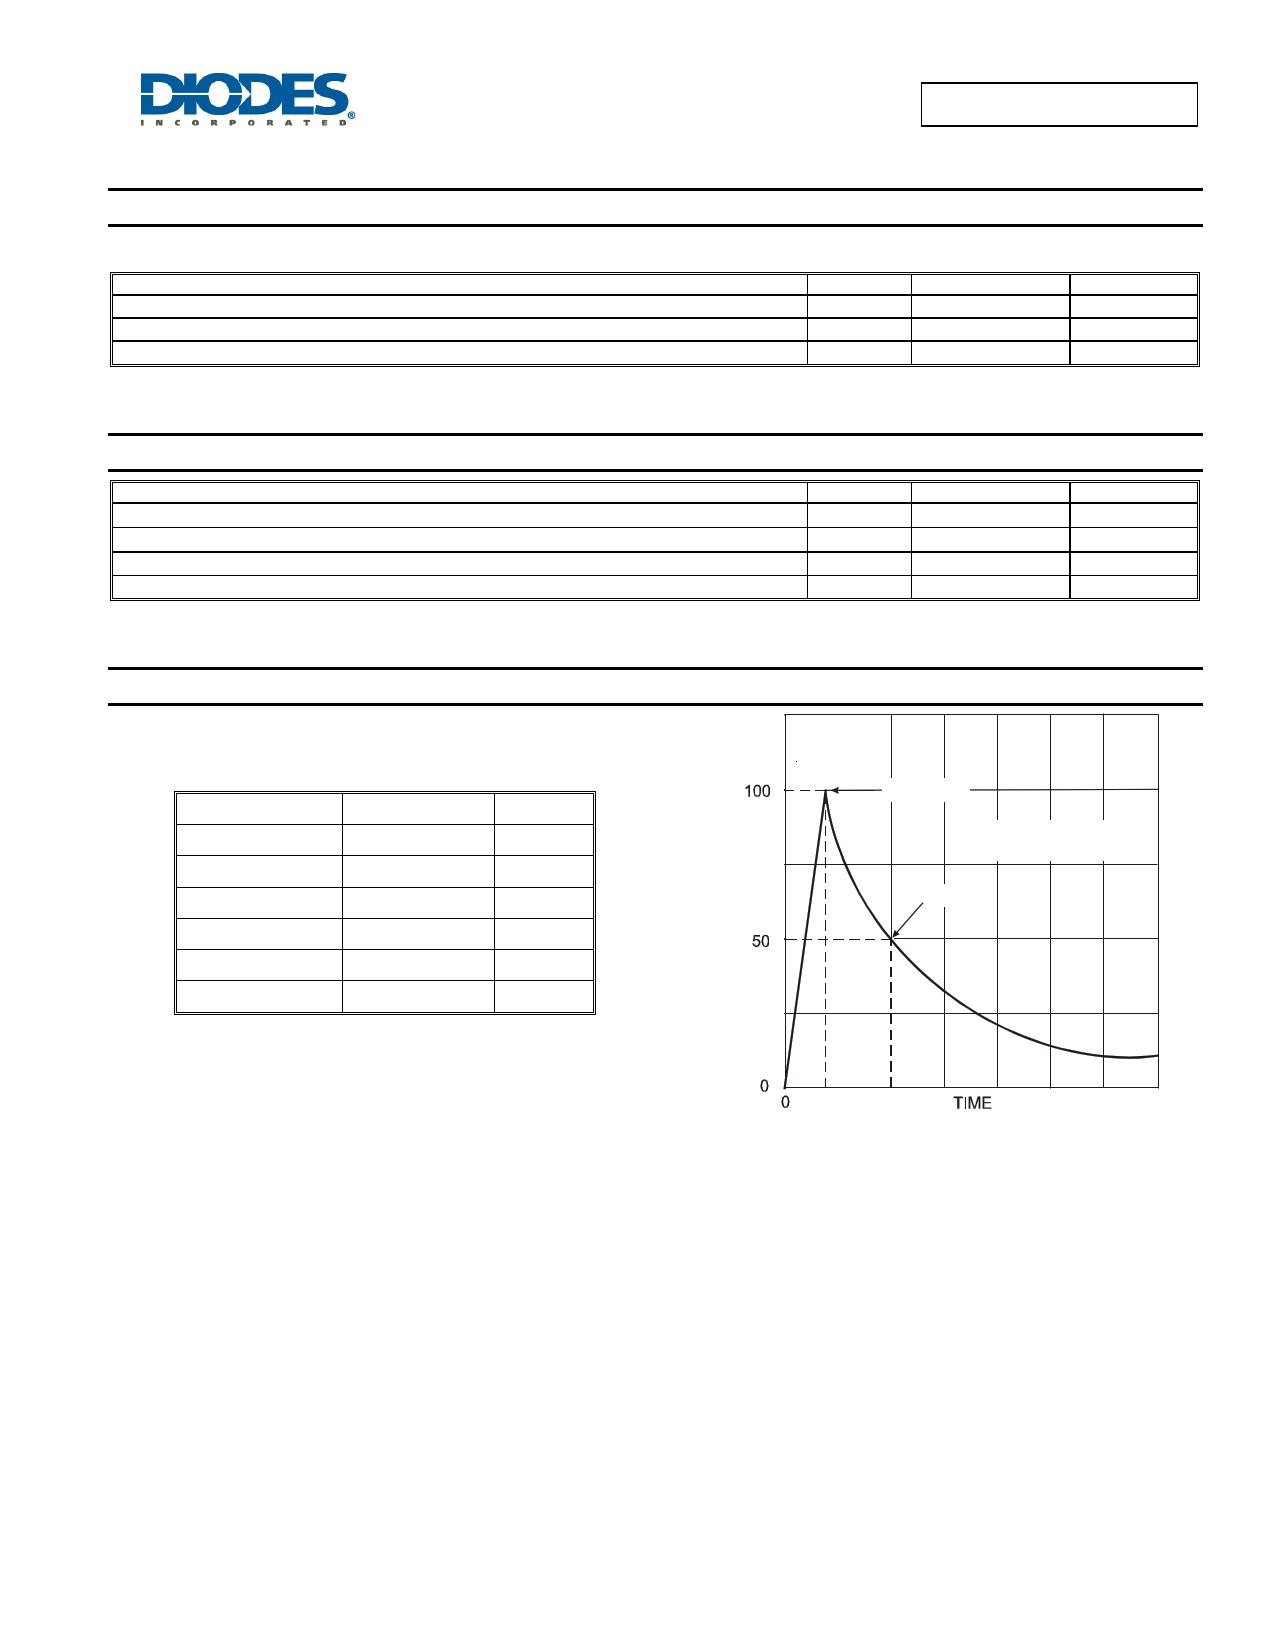 TB1100M pdf, equivalent, schematic